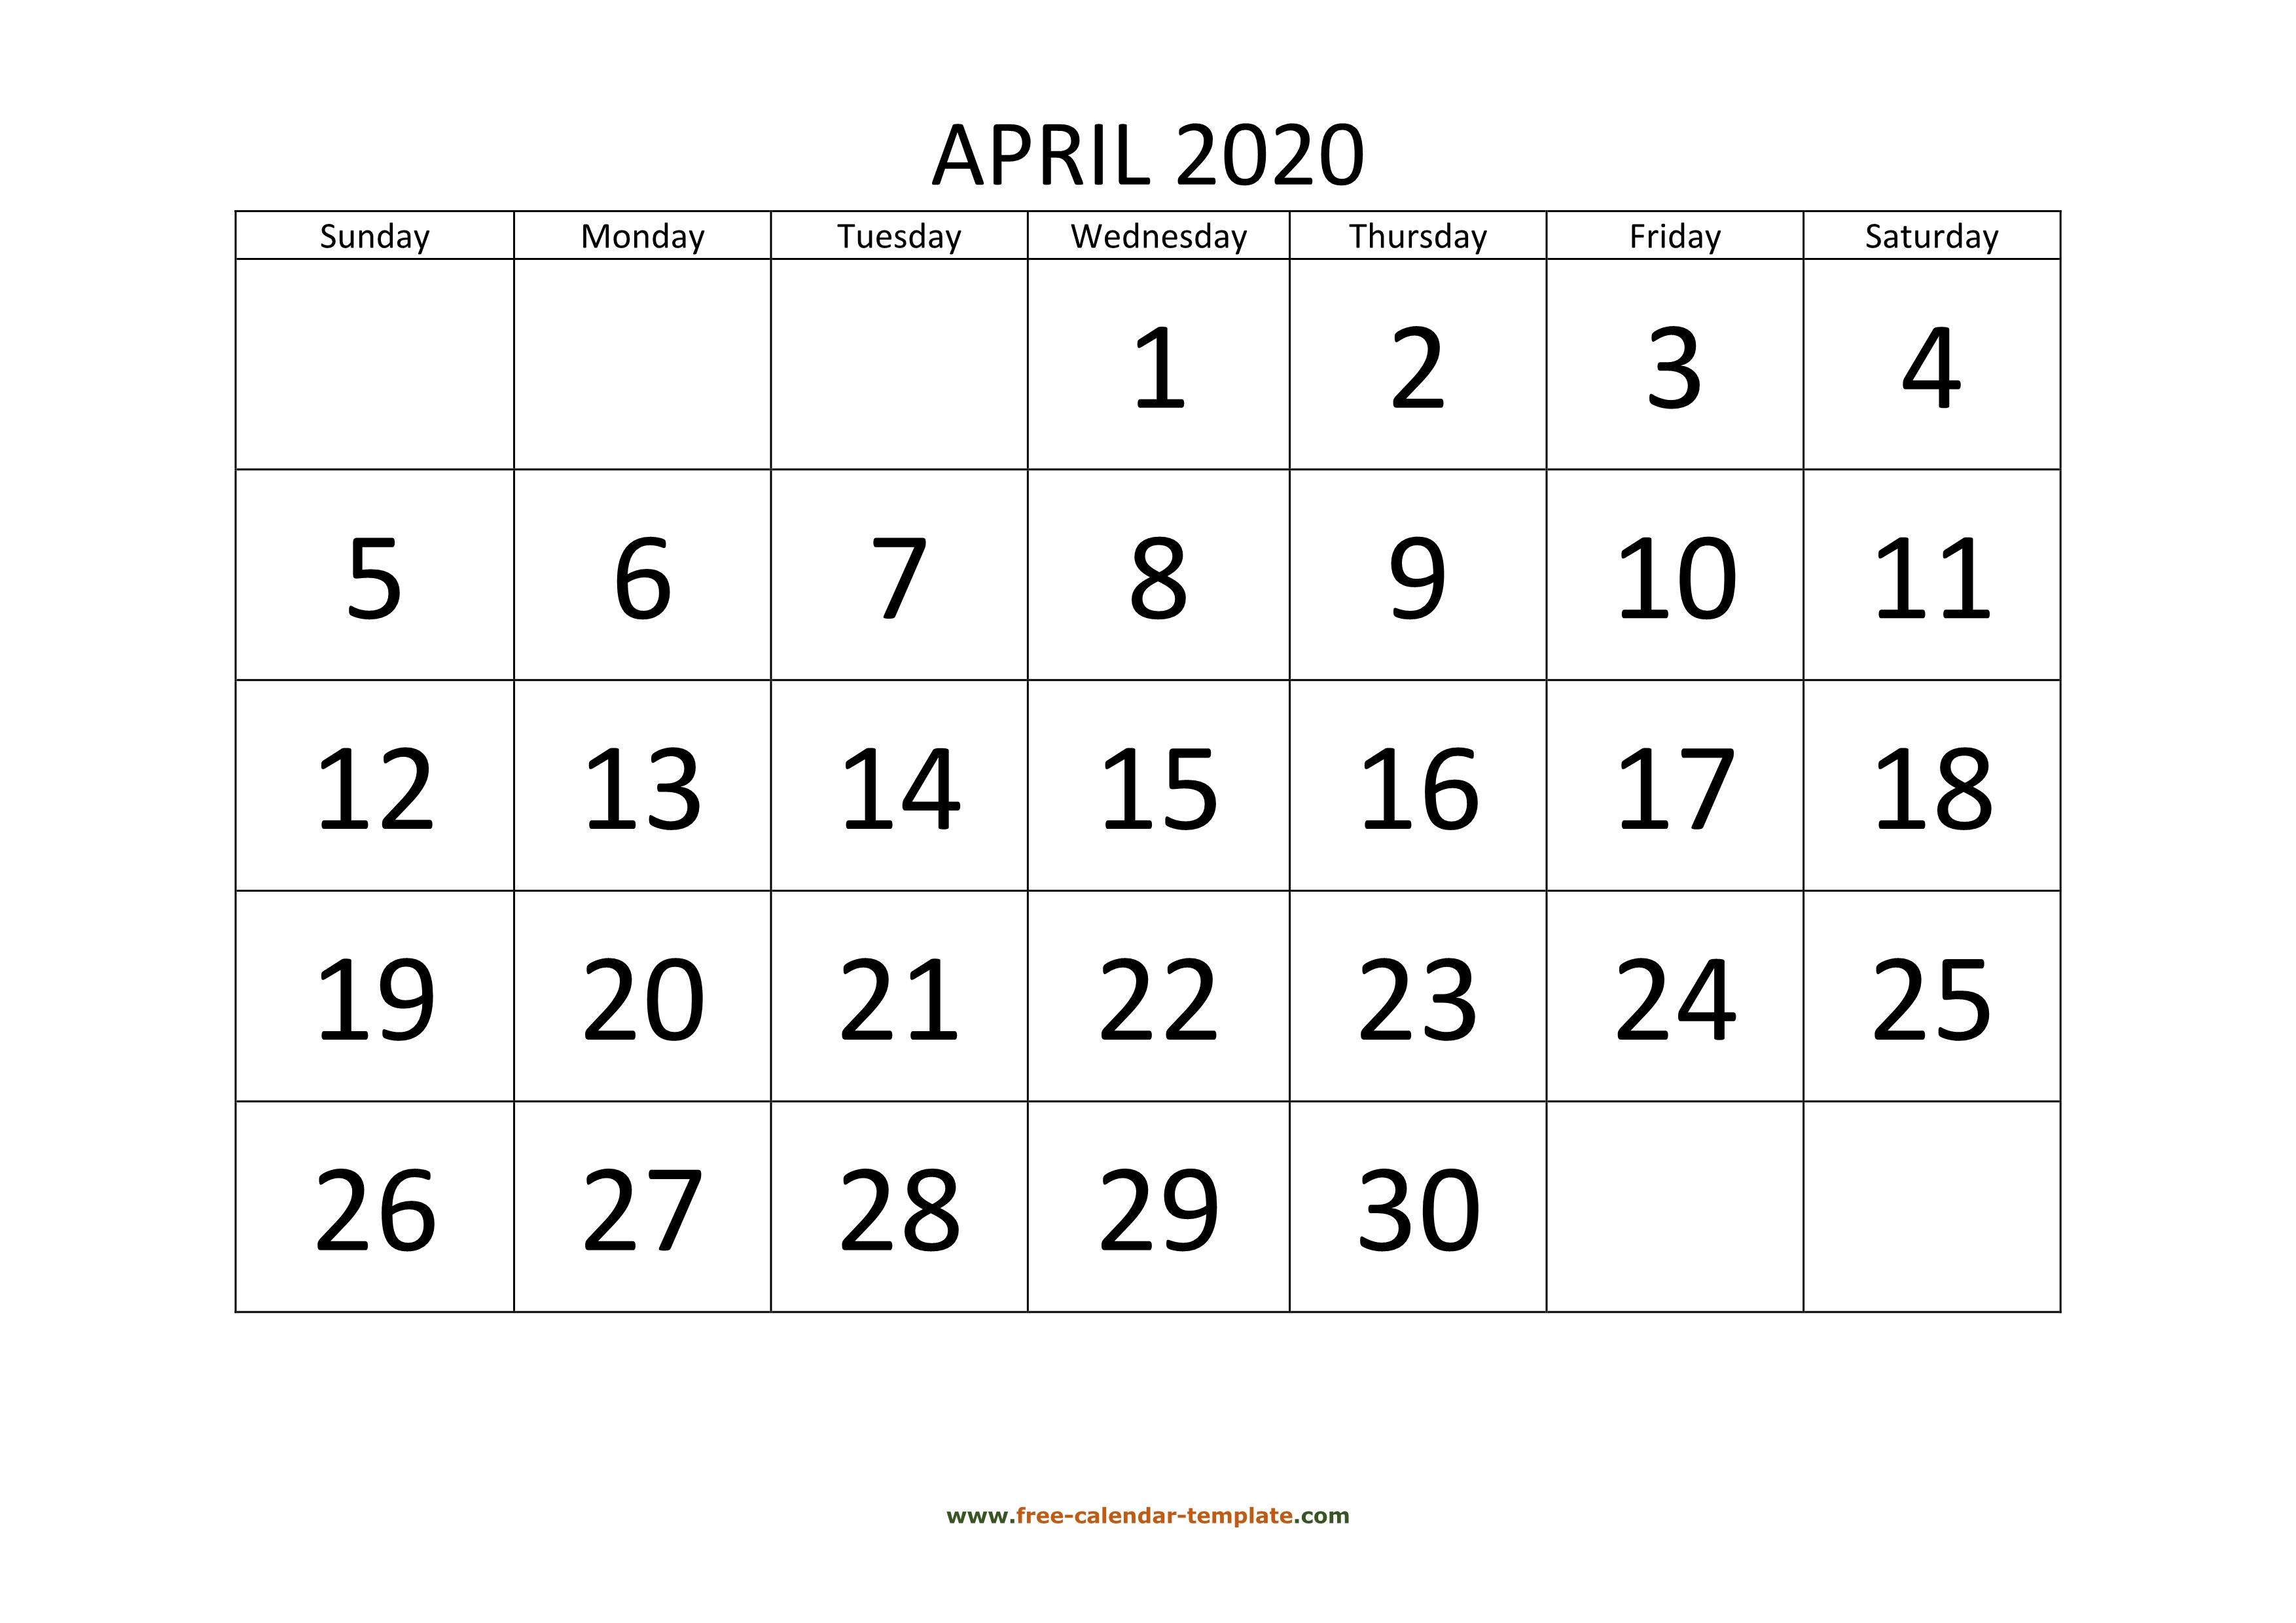 April 2020 Calendar Designed With Large Font (Horizontal